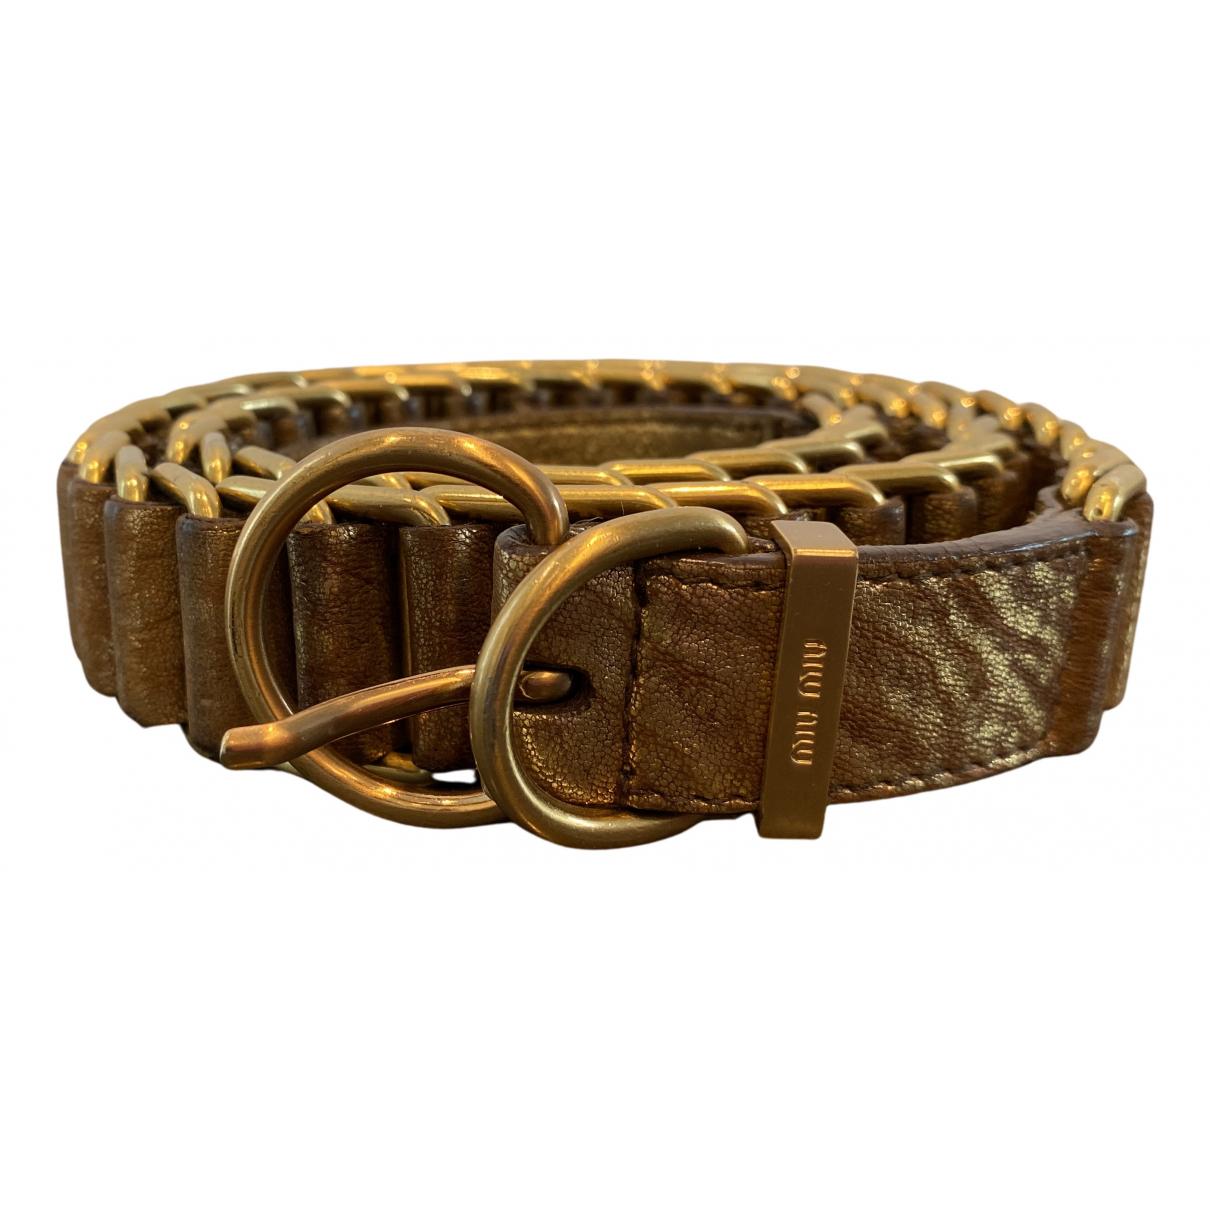 Miu Miu N Gold Leather belt for Women 85 cm